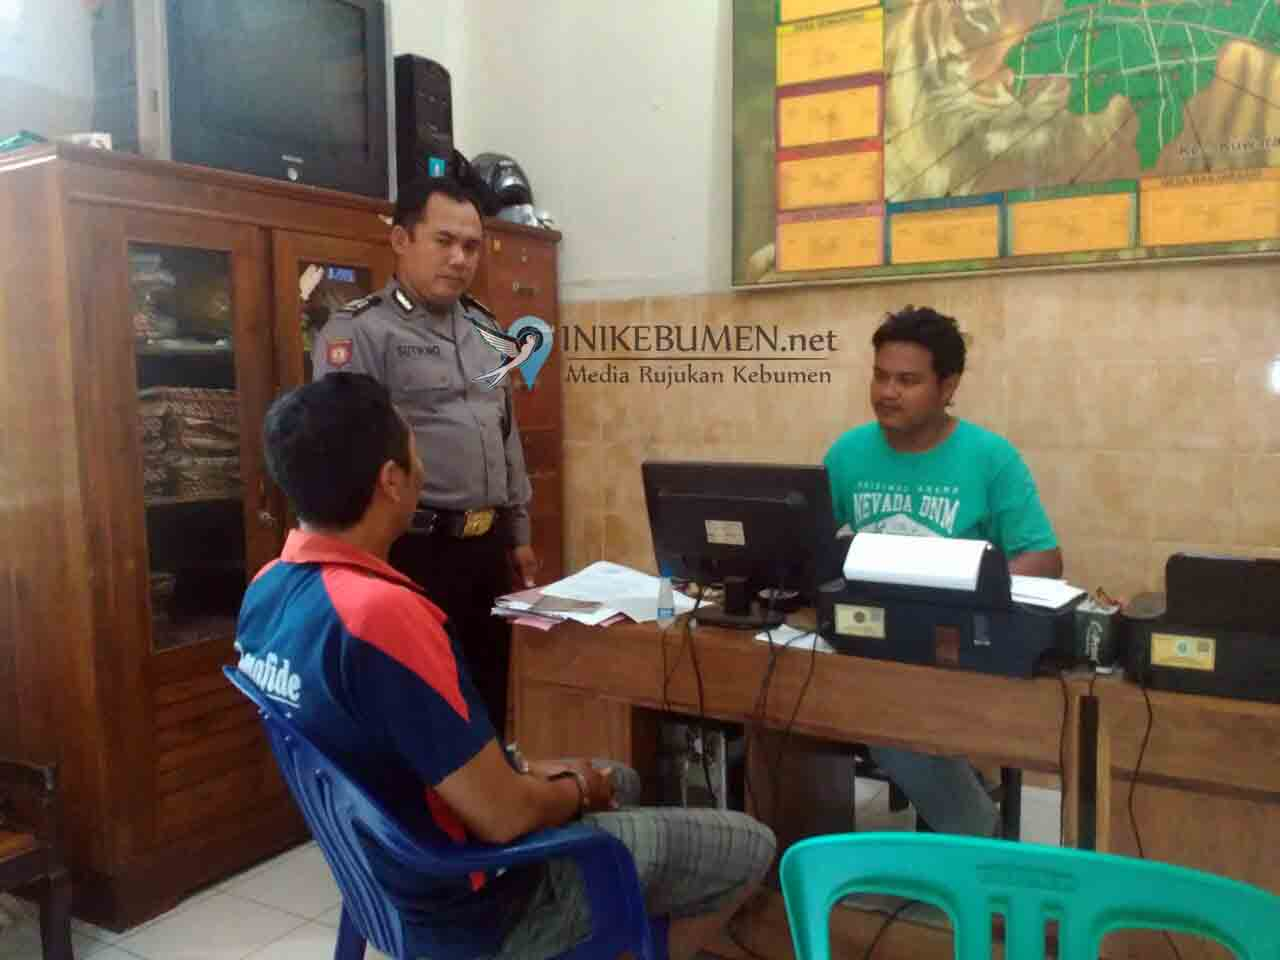 Gara-gara Nyimpan SIM Milik Korbannya, Warga Banjarnegara ini Ditangkap Polisi